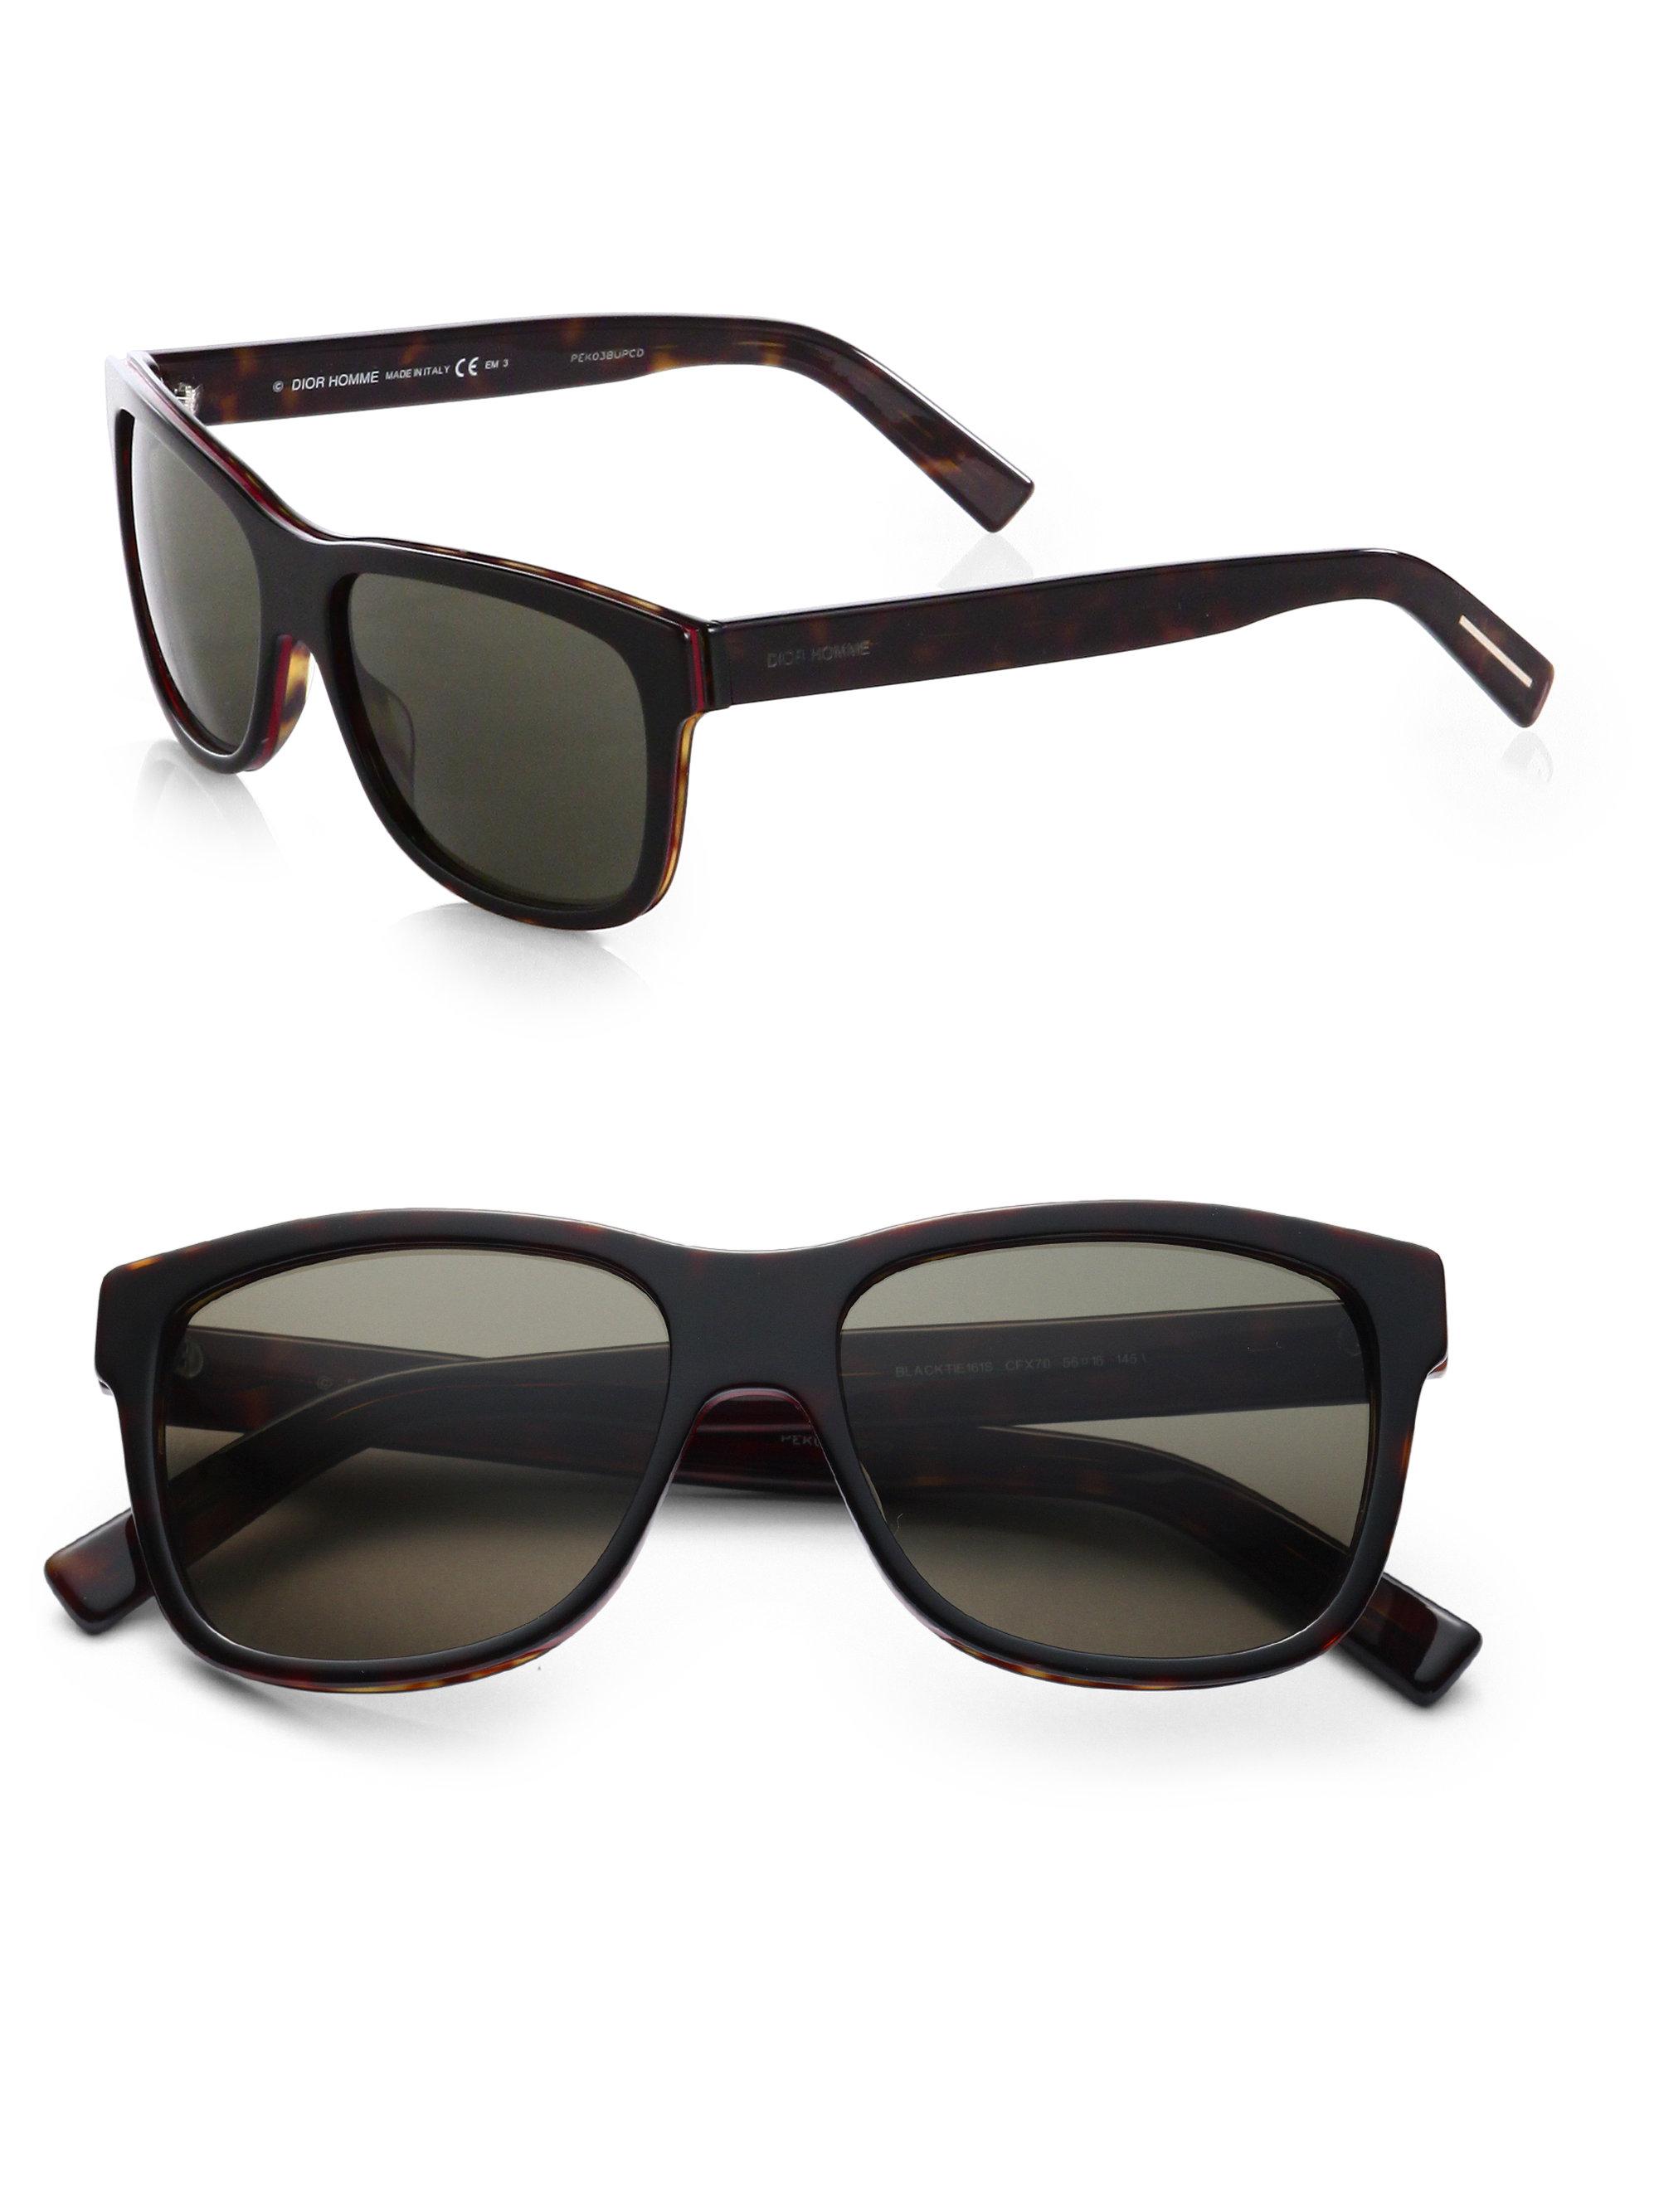 9c2916c9be Dior Homme Acetate Wayfarer Sunglasses in Black for Men - Lyst